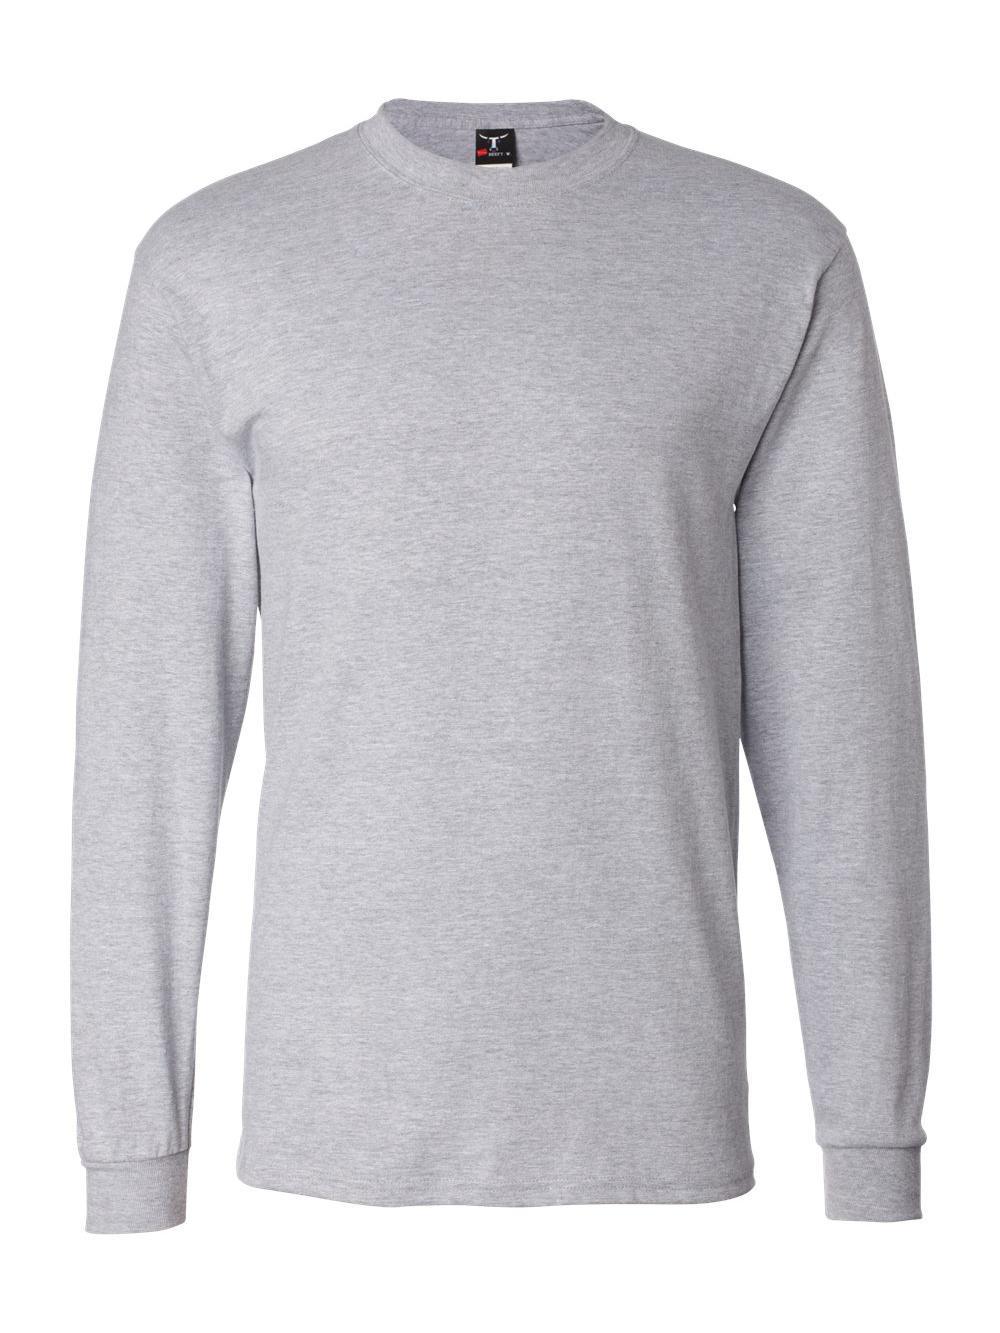 Hanes-Beefy-T-Long-Sleeve-T-Shirt-5186 thumbnail 33